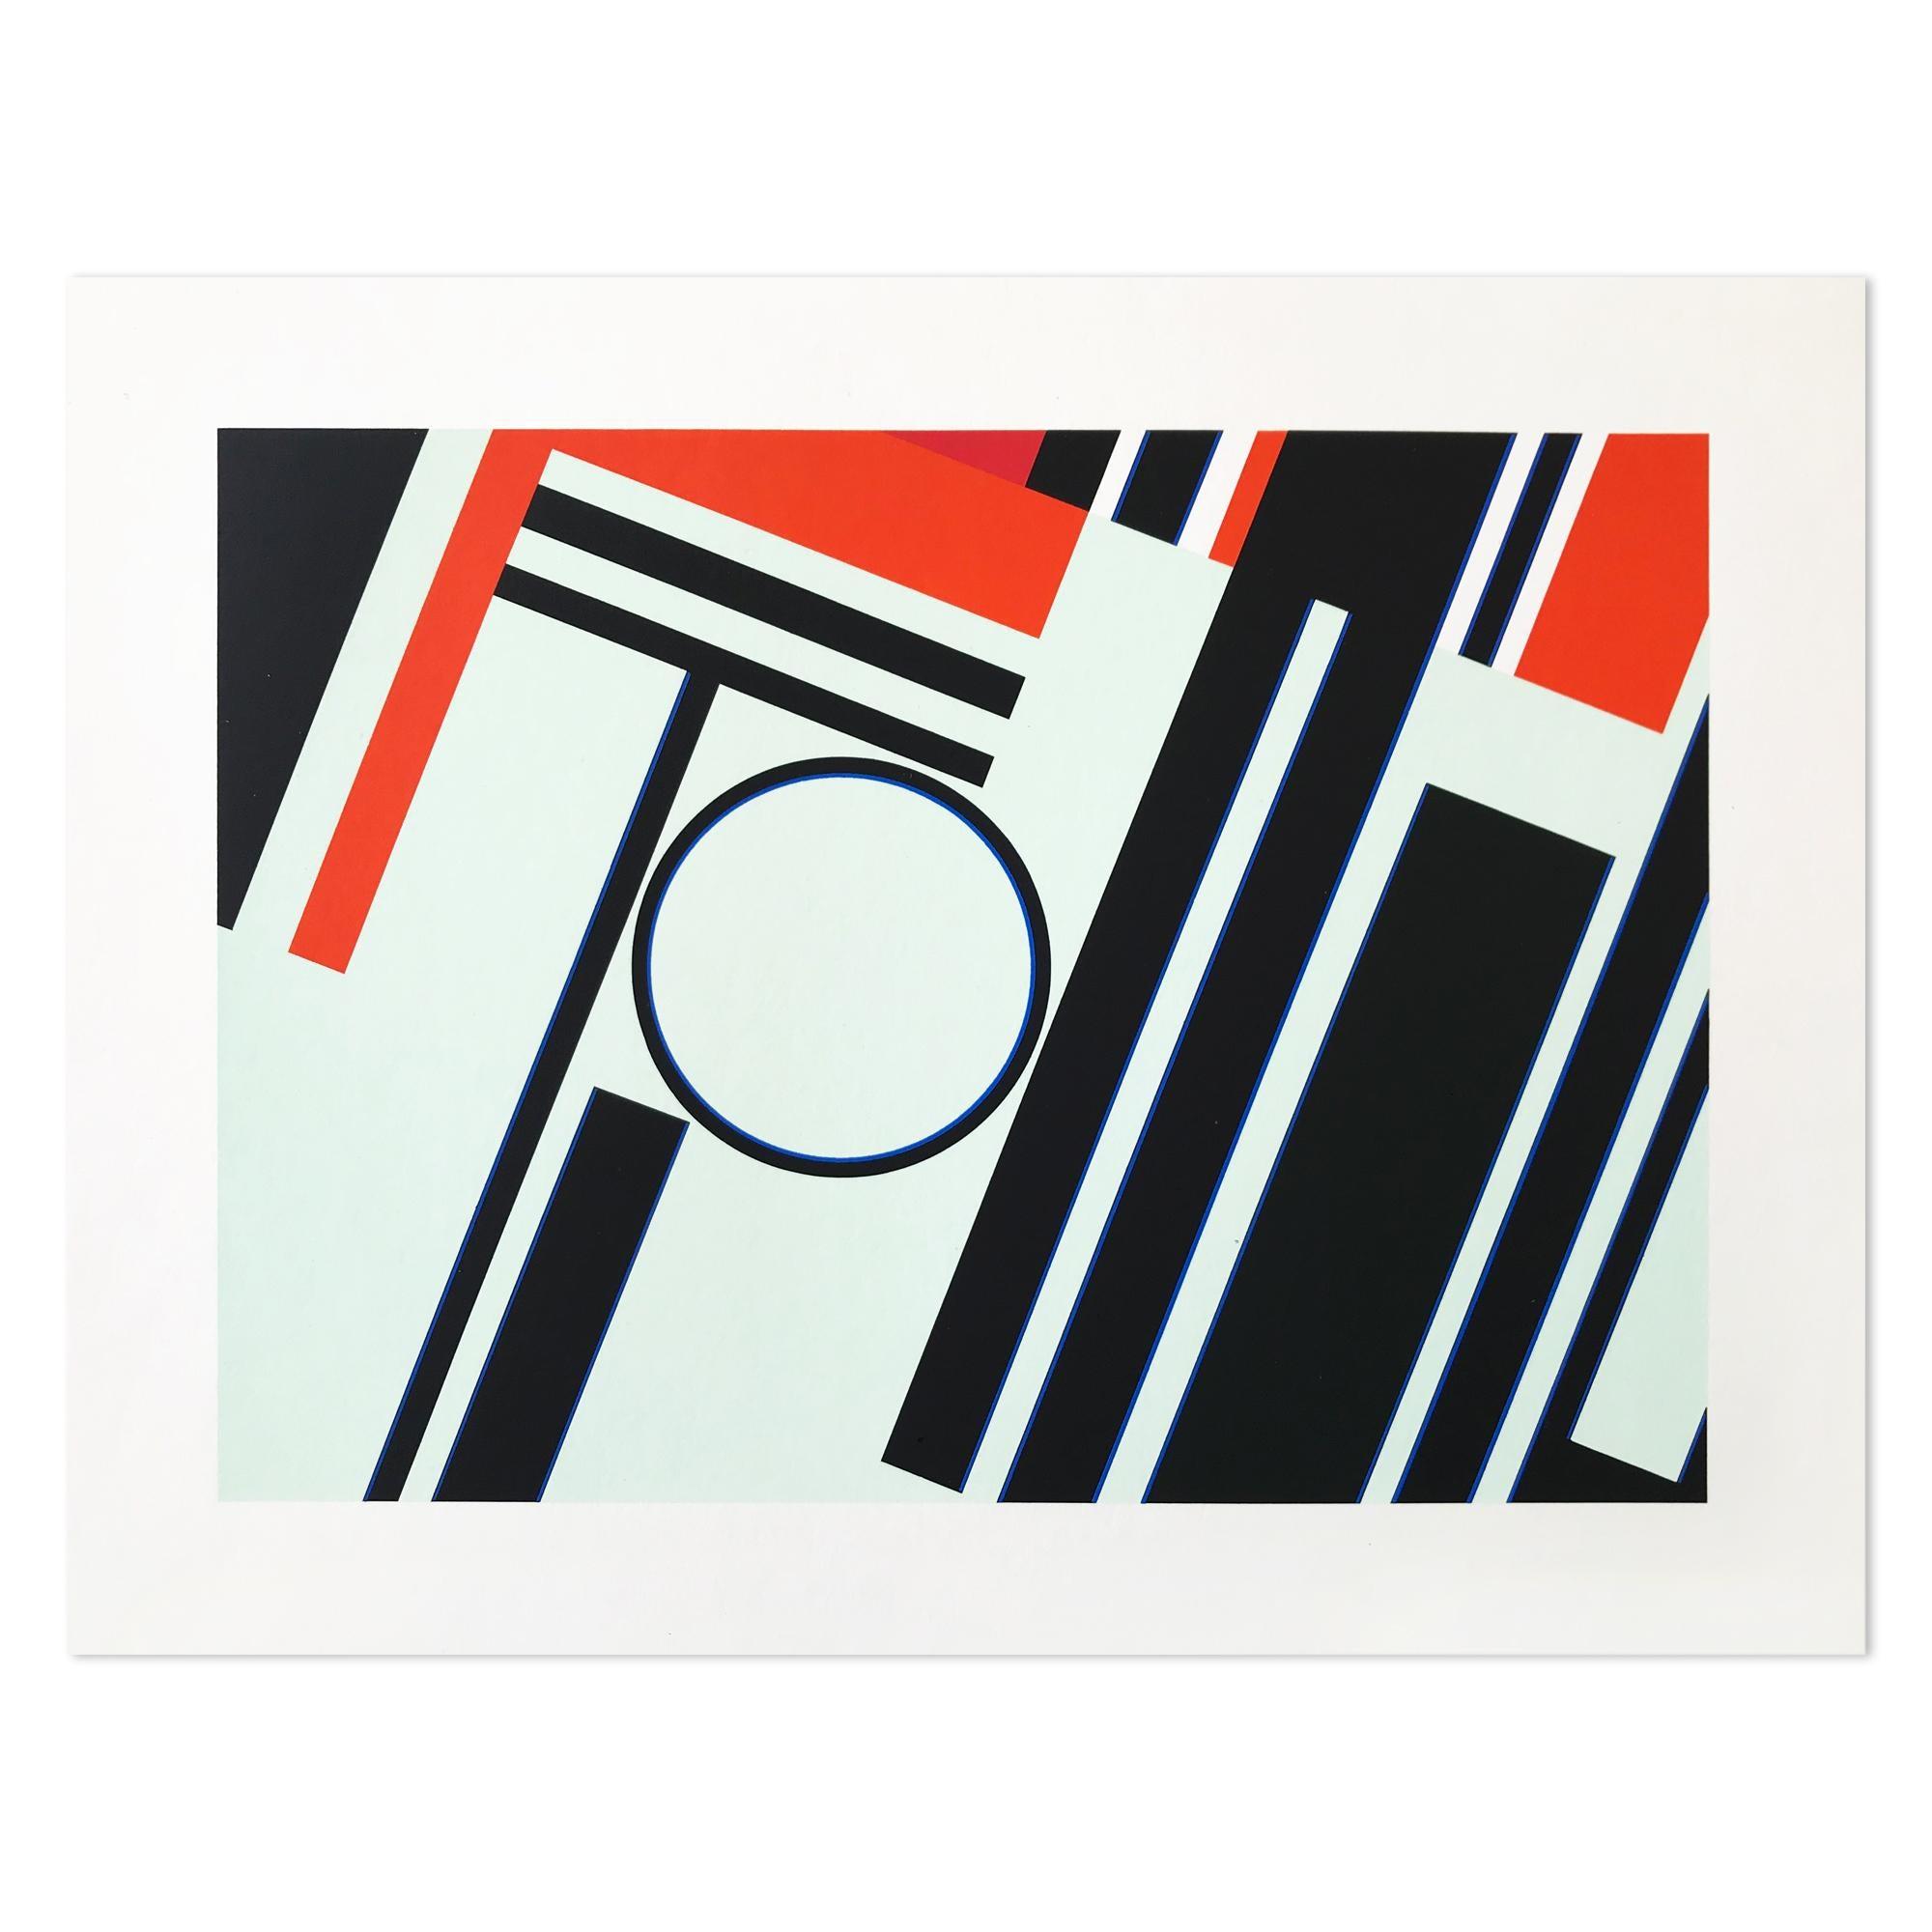 Kreis und Wirkung, Geometric Abstraction, Abstract Art, Constructivism